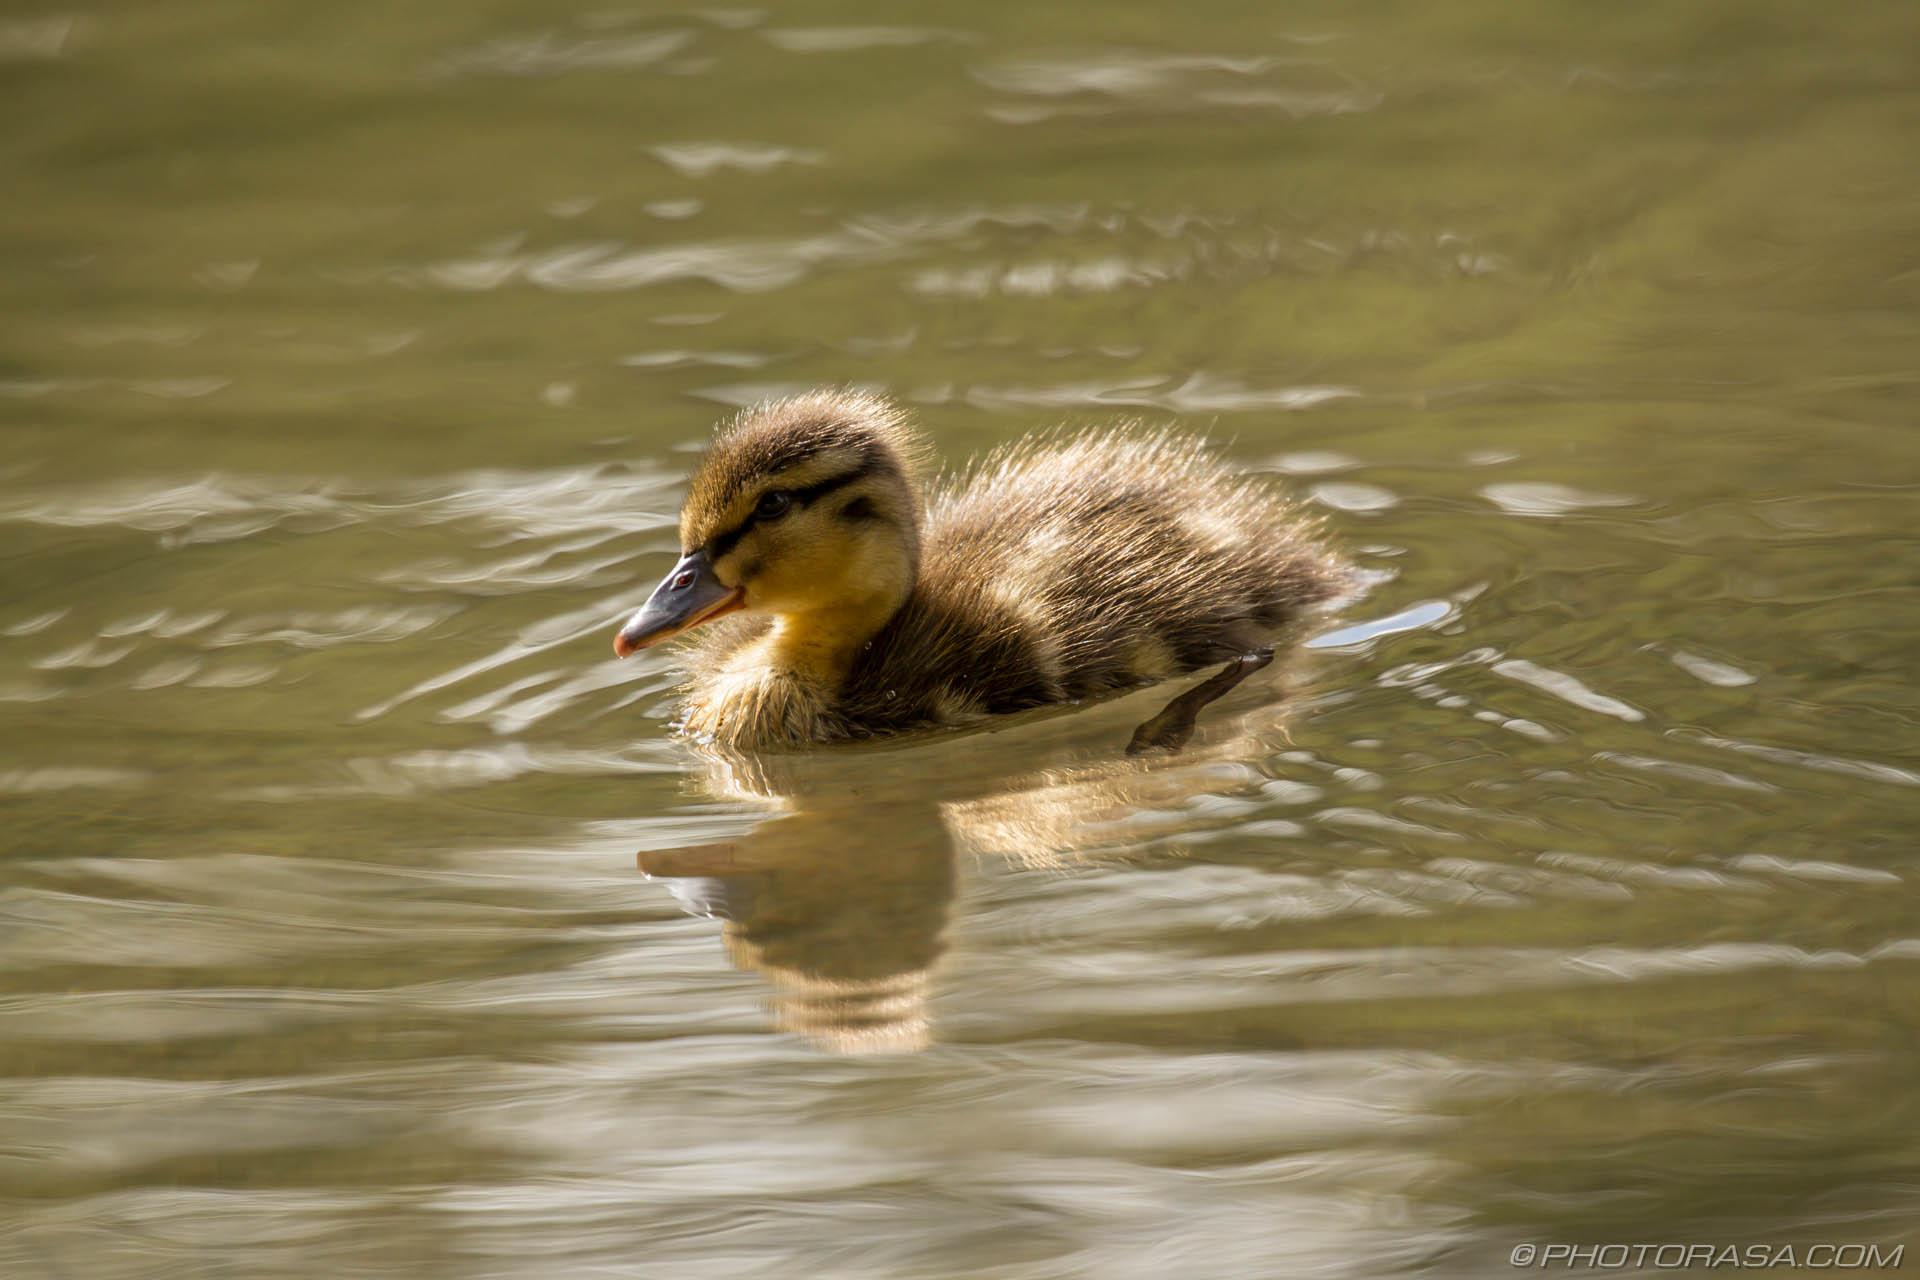 https://photorasa.com/mallard-ducks/paddling-baby-duck-in-sunlight/